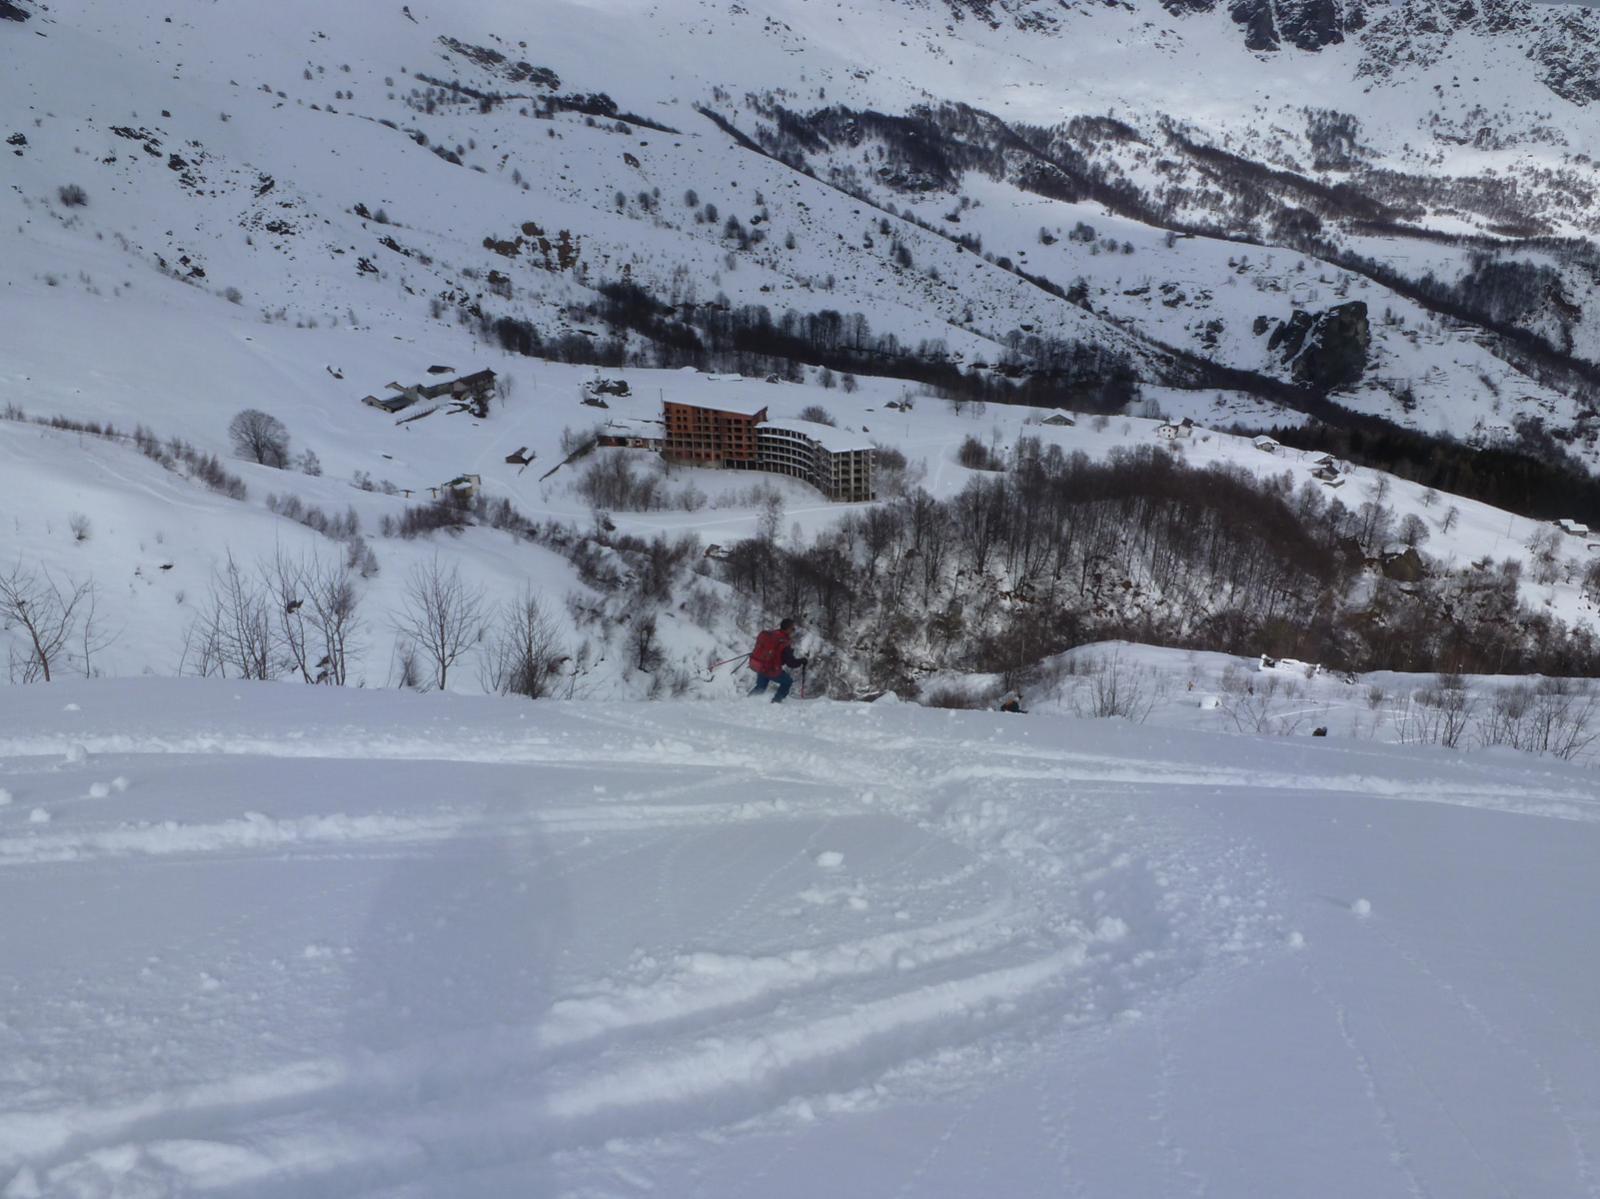 Discesa verso l'alpe Belvedere